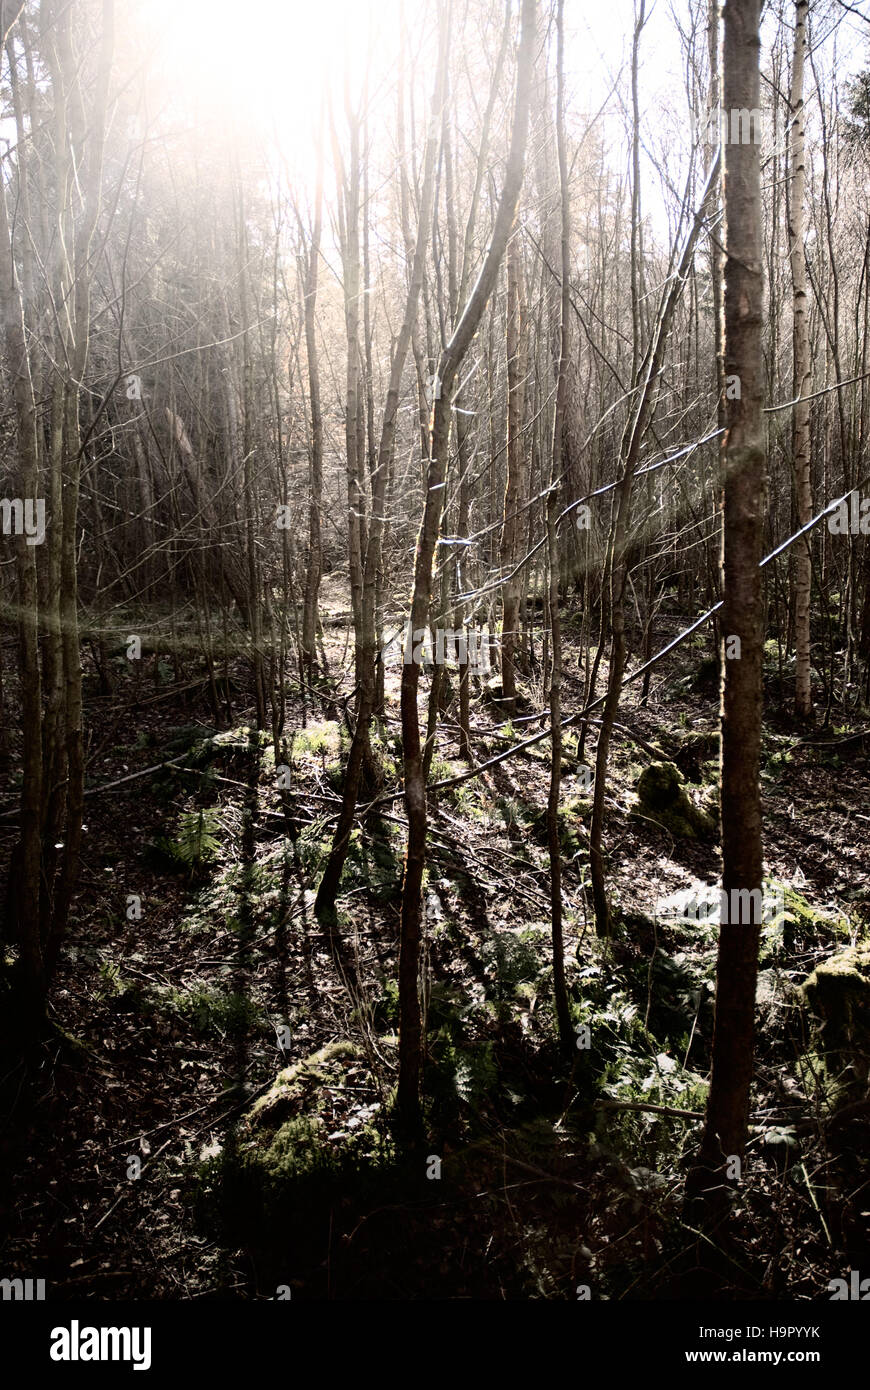 Sun shining through birch trees in Butterdean Wood, near Gladsmuir, East Lothian - Stock Image